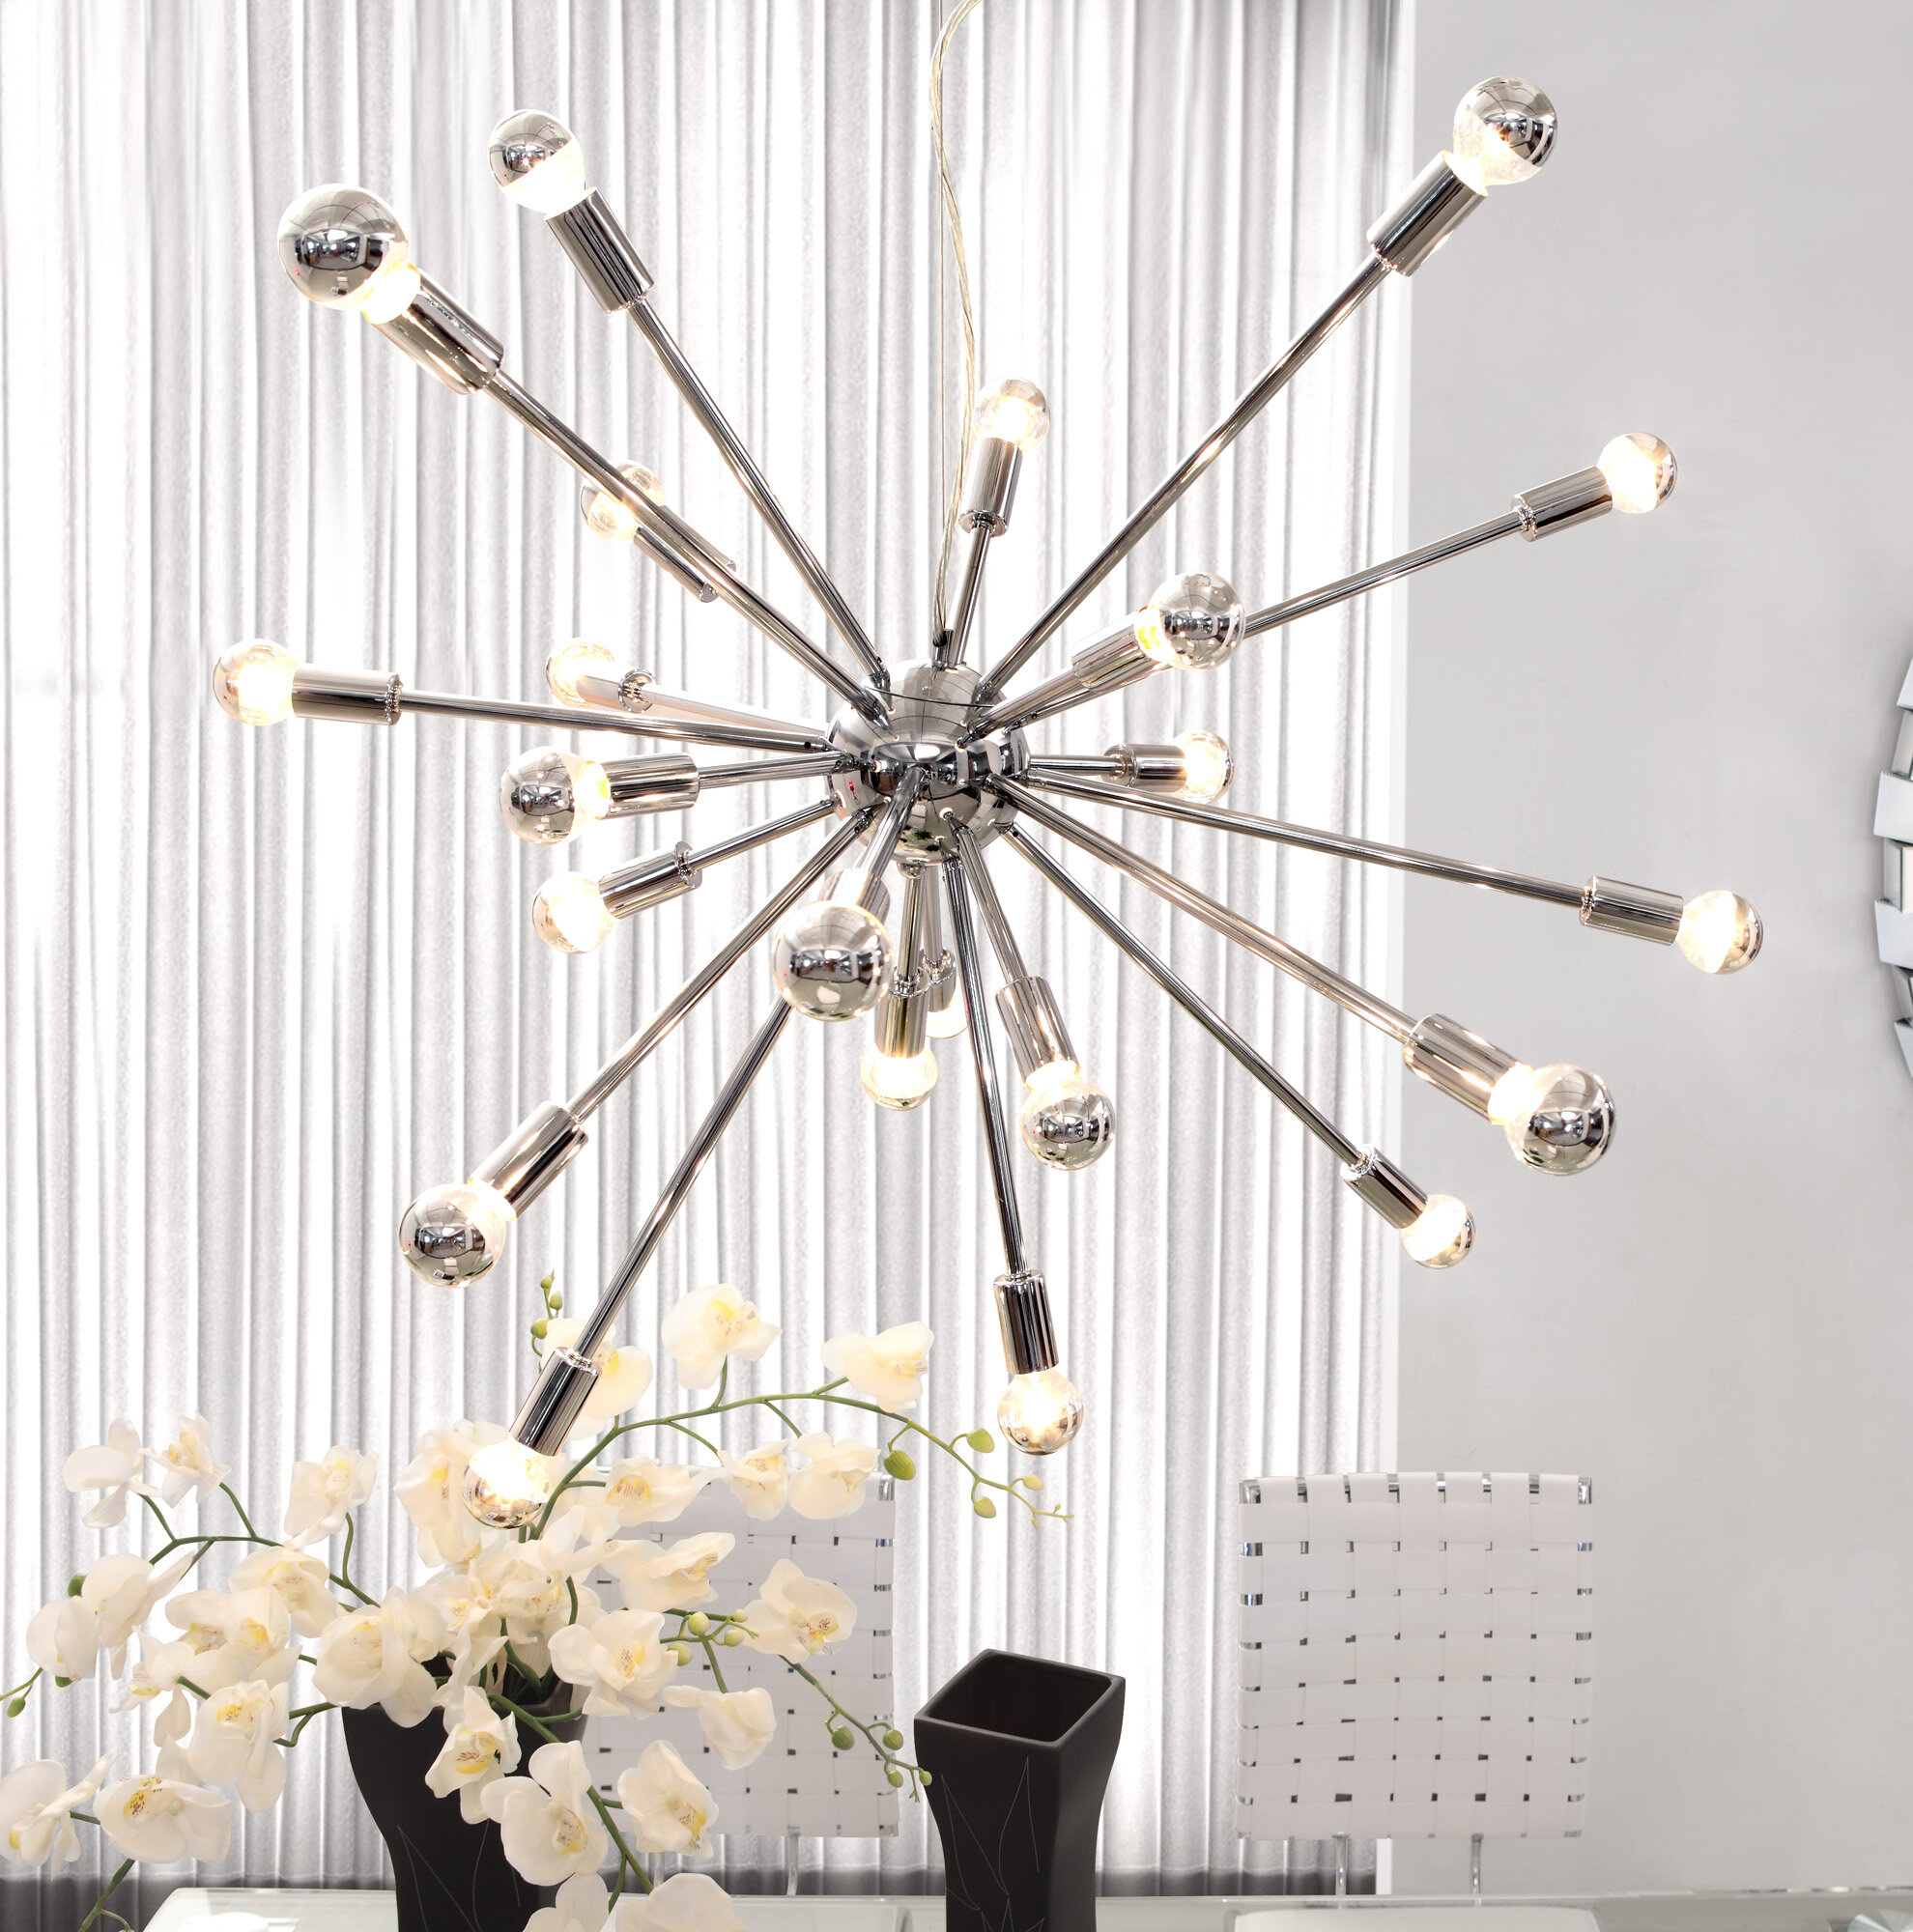 pendant glass lights murano brass sale with impressive at furniture sputnik lighting chandeliers chandelier f urchin for master teardrops id